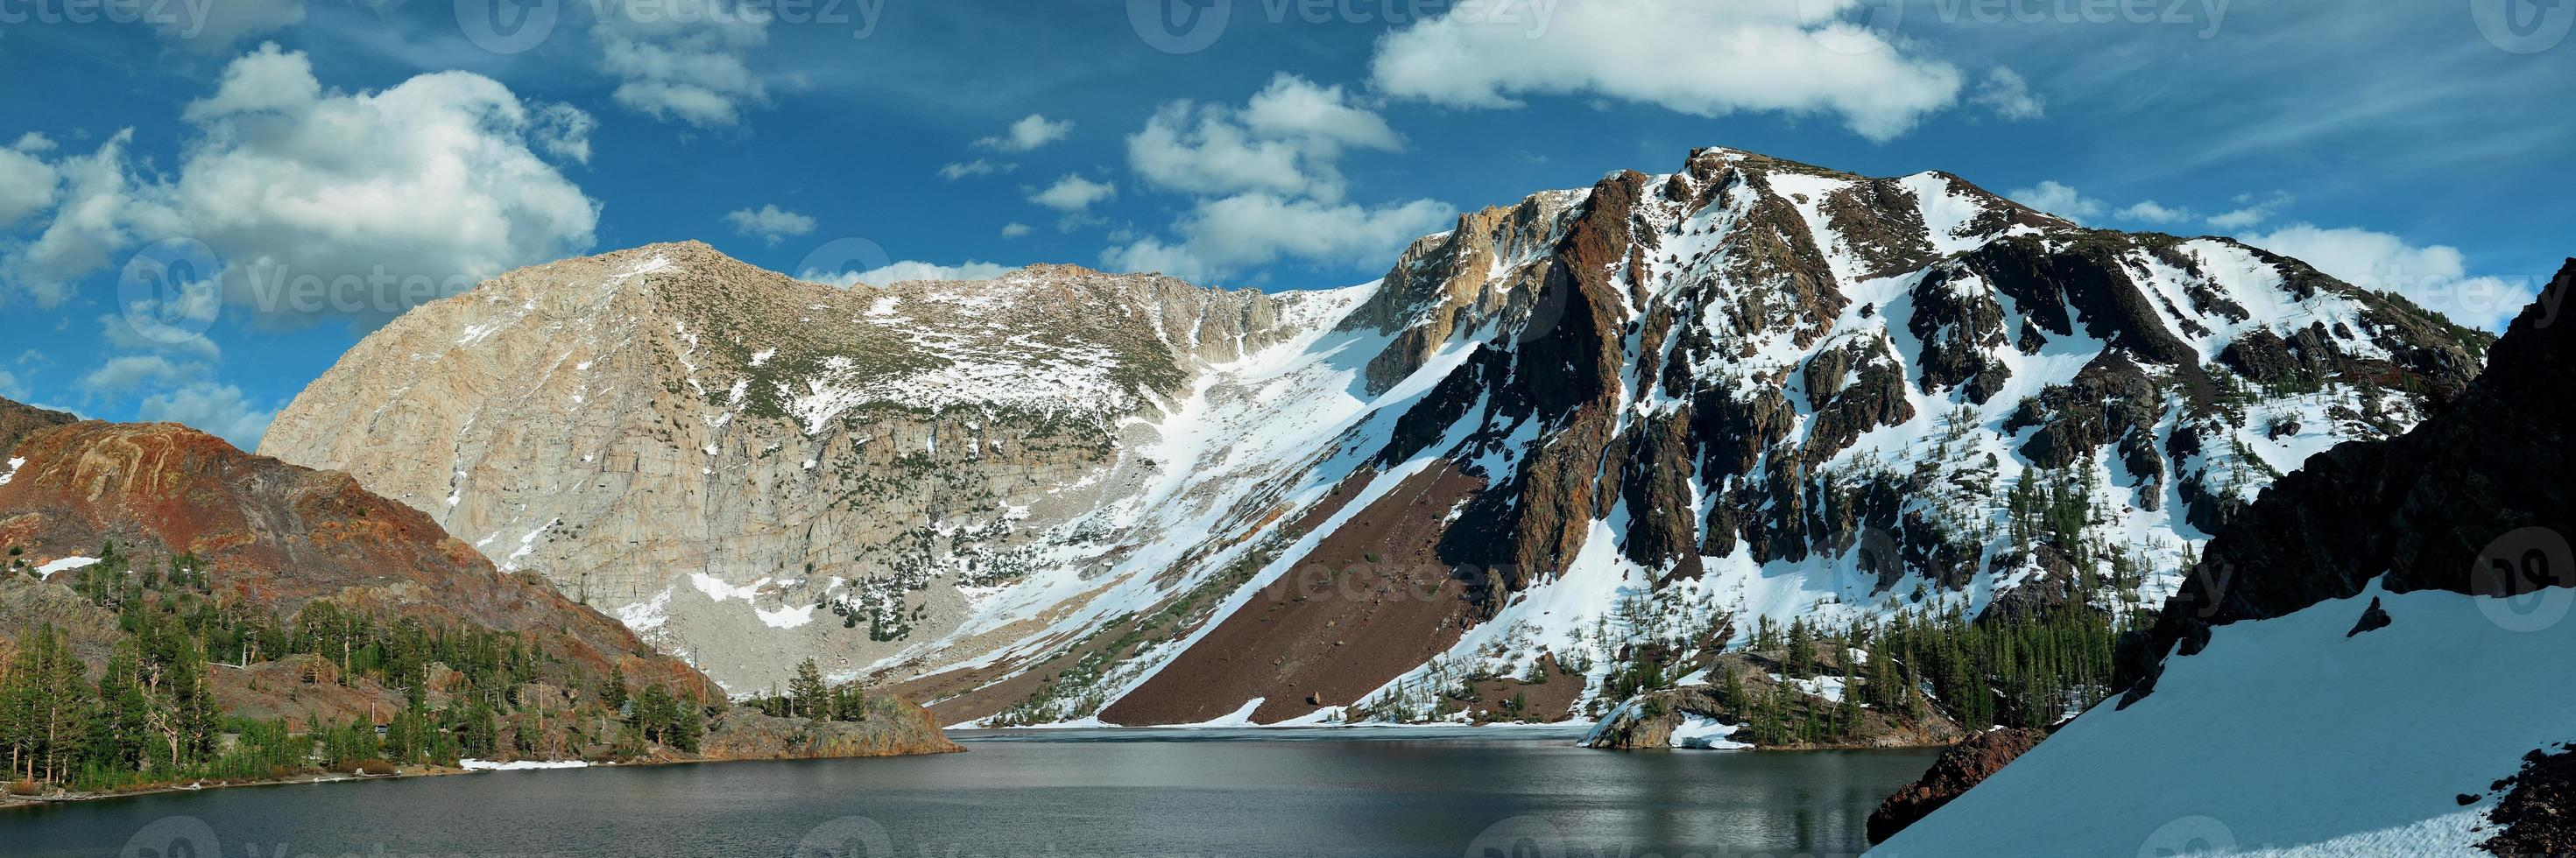 lago de montaña de nieve foto